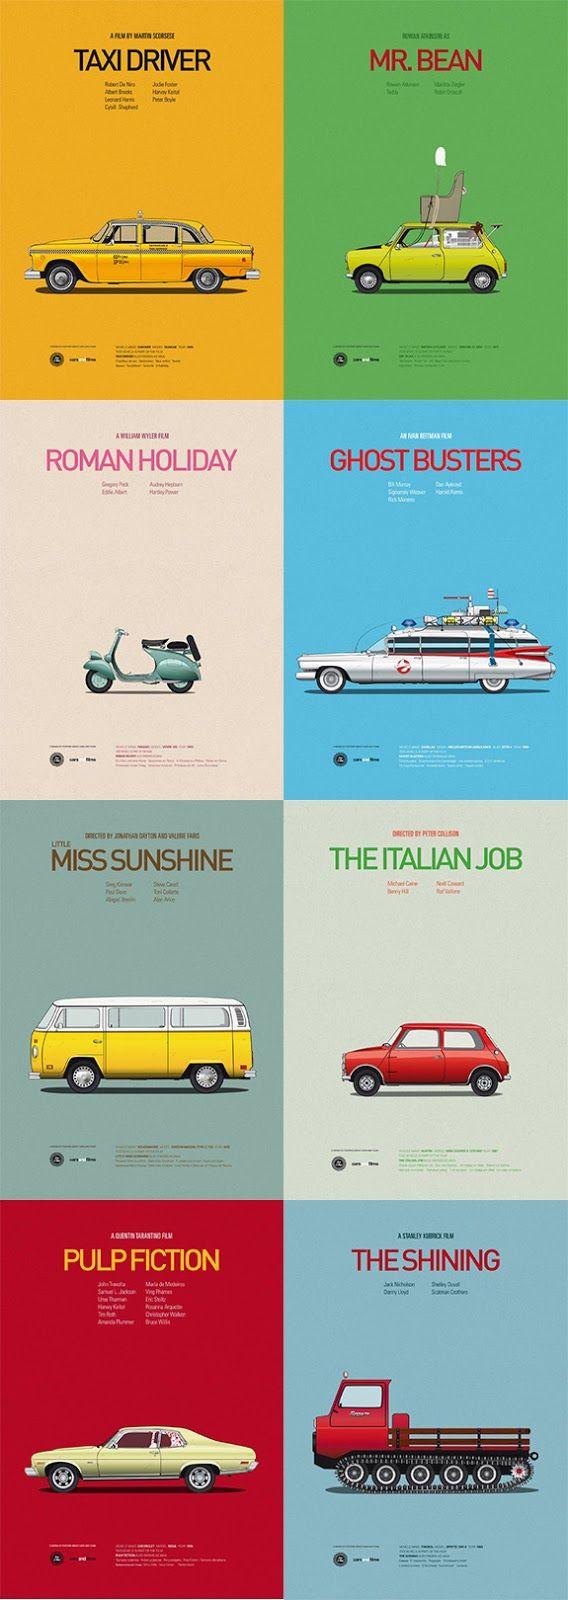 Poster design jobs london - Download